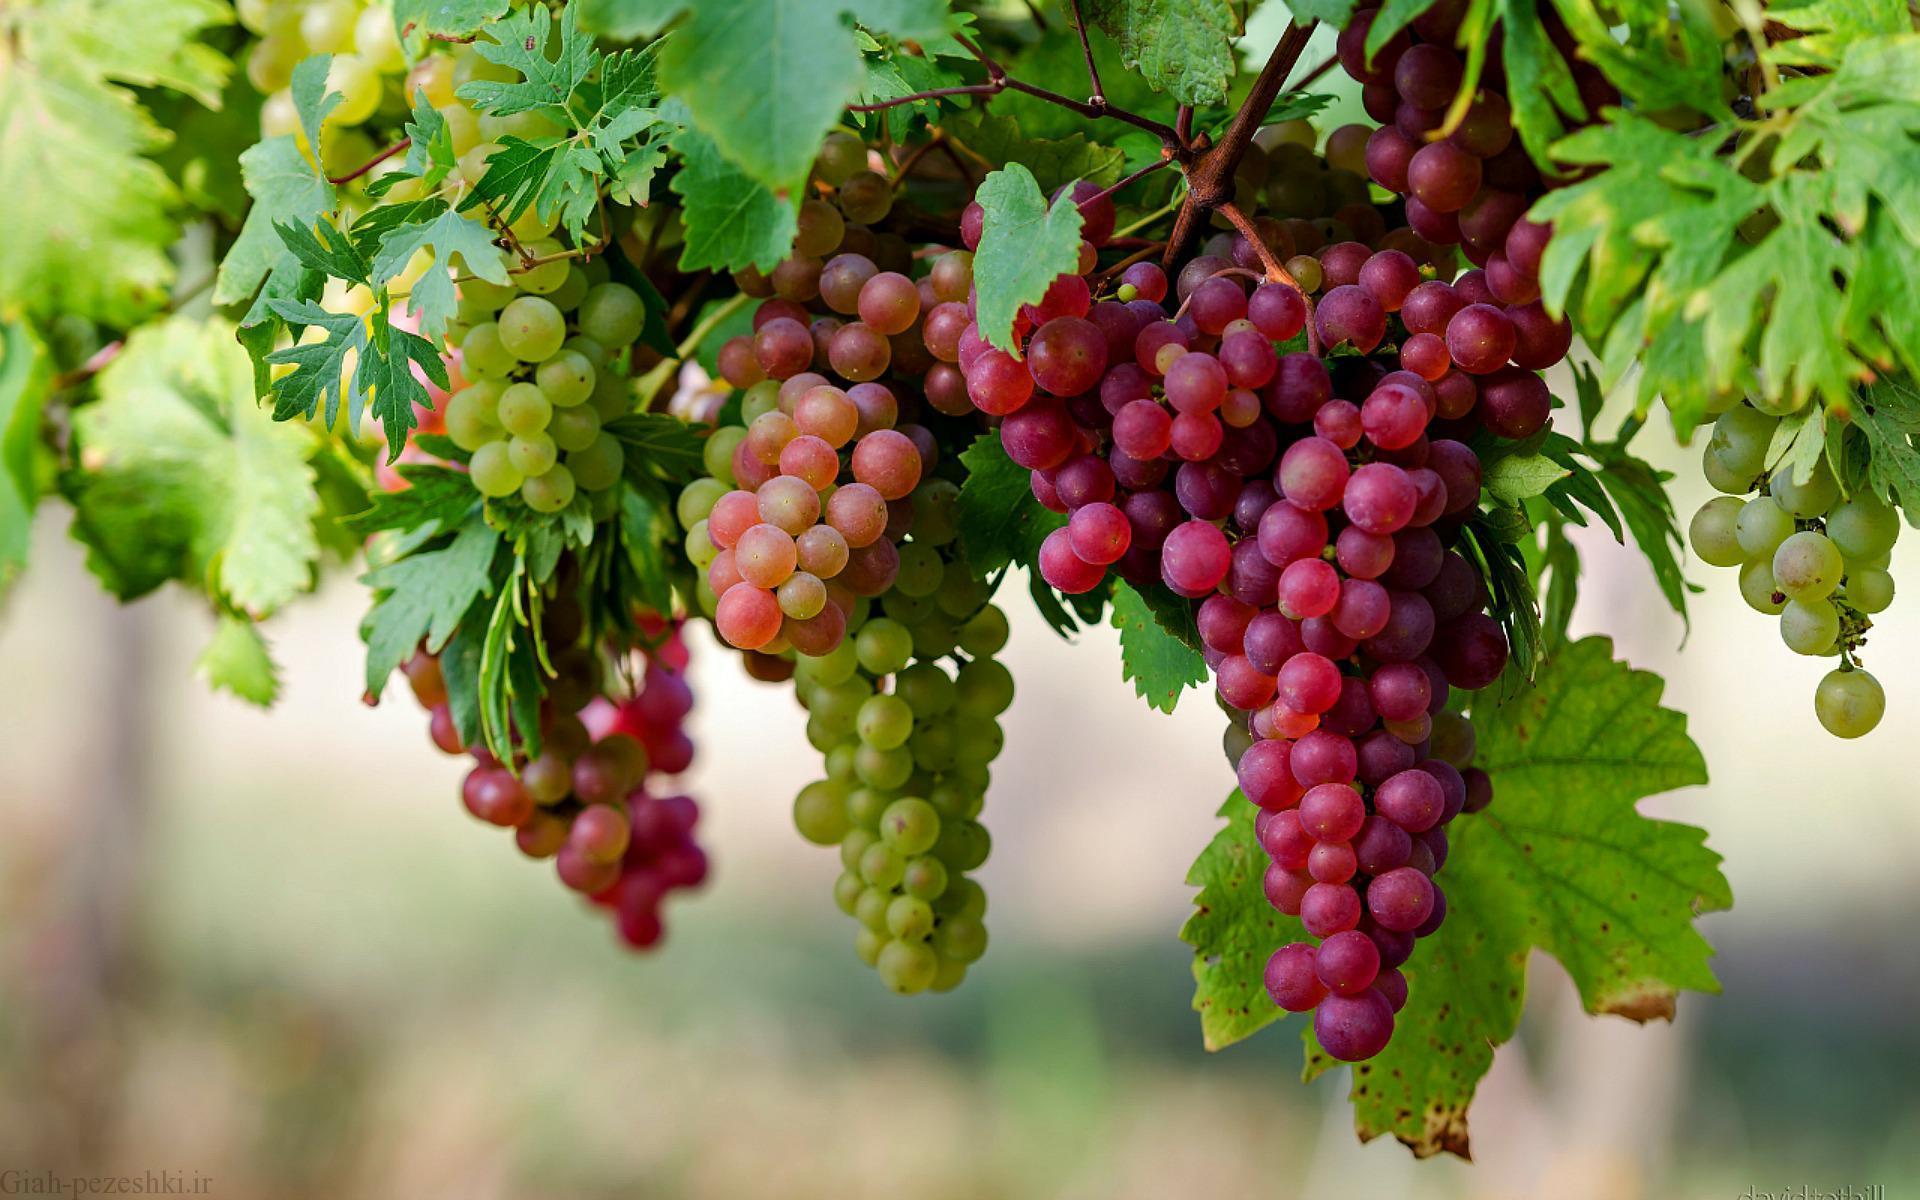 علت عدم میوه دهی مناسب درخت انگور